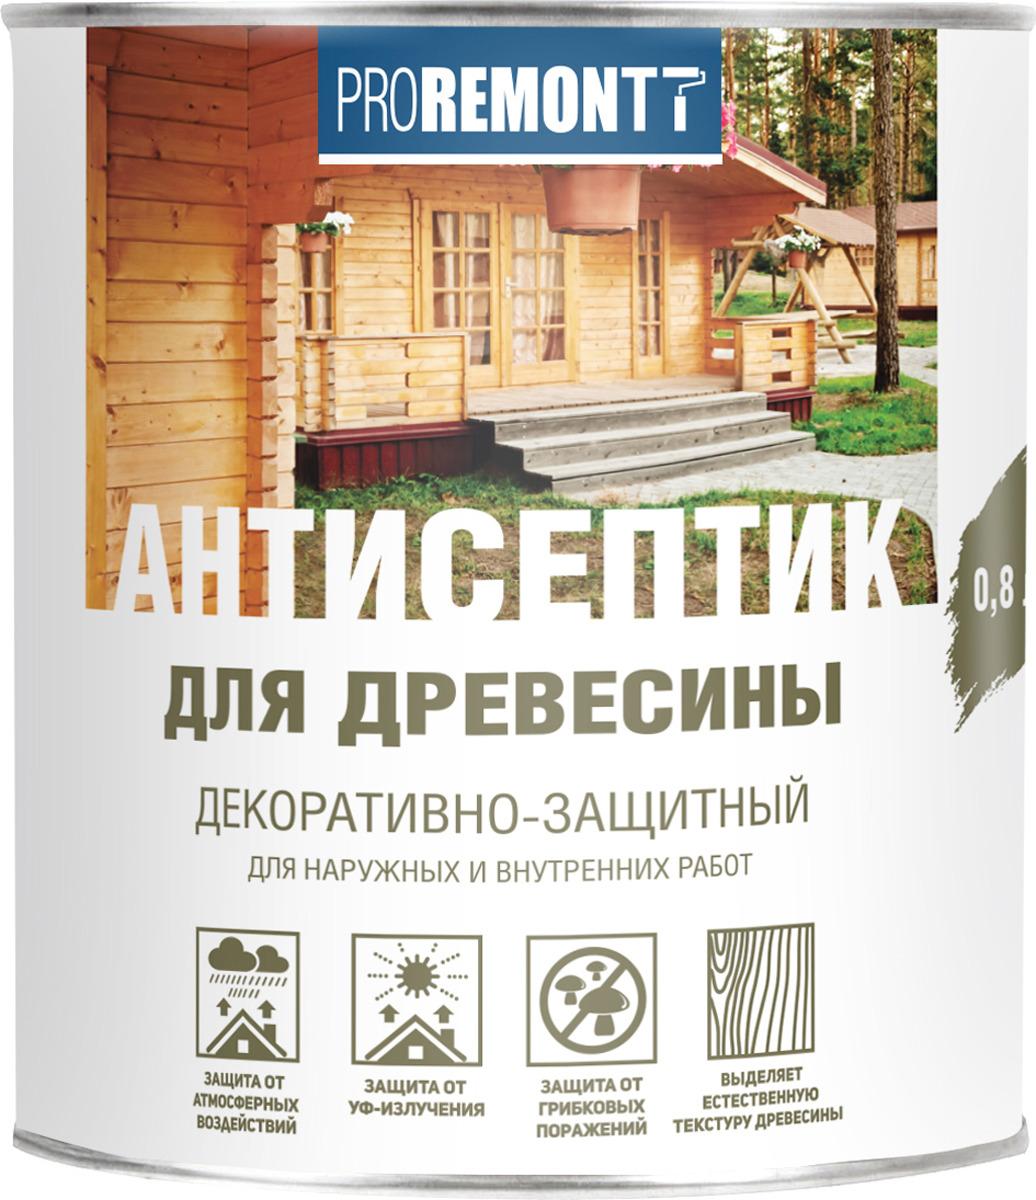 Антисептик для древесины Proremontt, махагон, 800 мл цена и фото